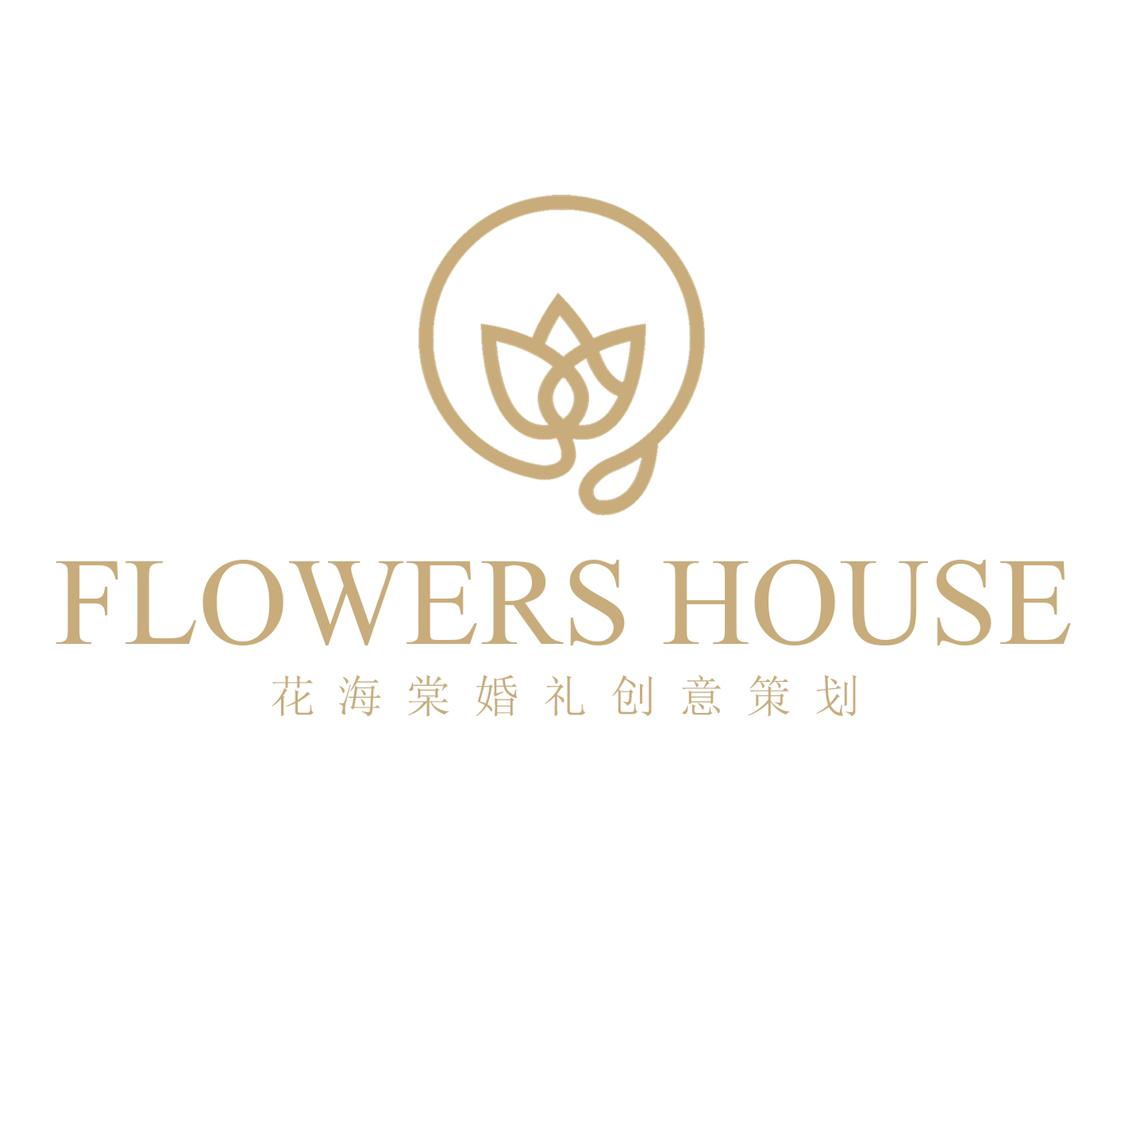 flowers house花海棠婚礼